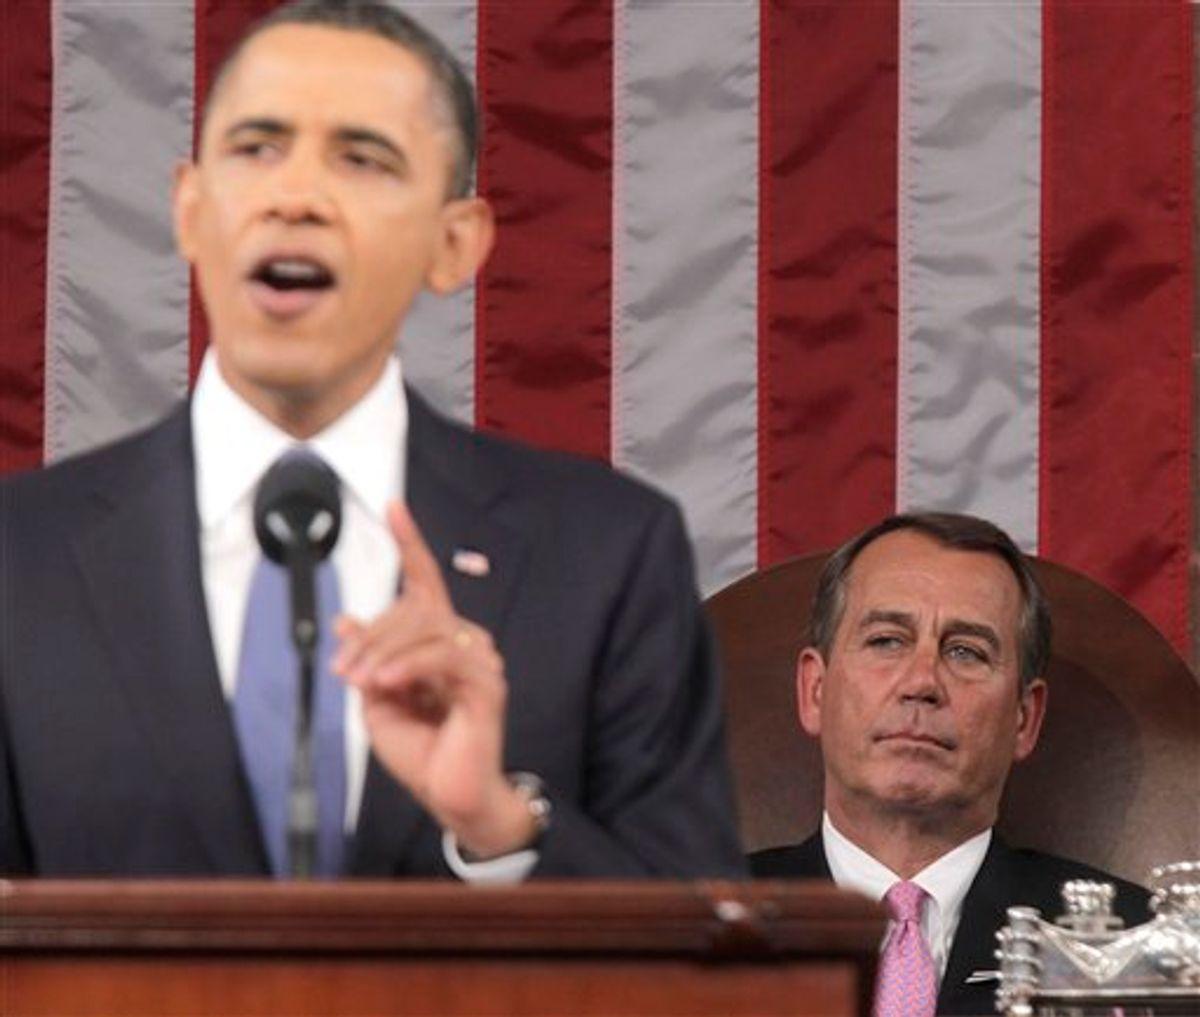 House Speaker John Boehner of Ohio watches as President Barack Obama delivers his State of the Union address on Capitol Hill in Washington, Tuesday, Jan. 25, 2011.  (AP Photo/Pablo Martinez Monsivais, Pool) (AP)